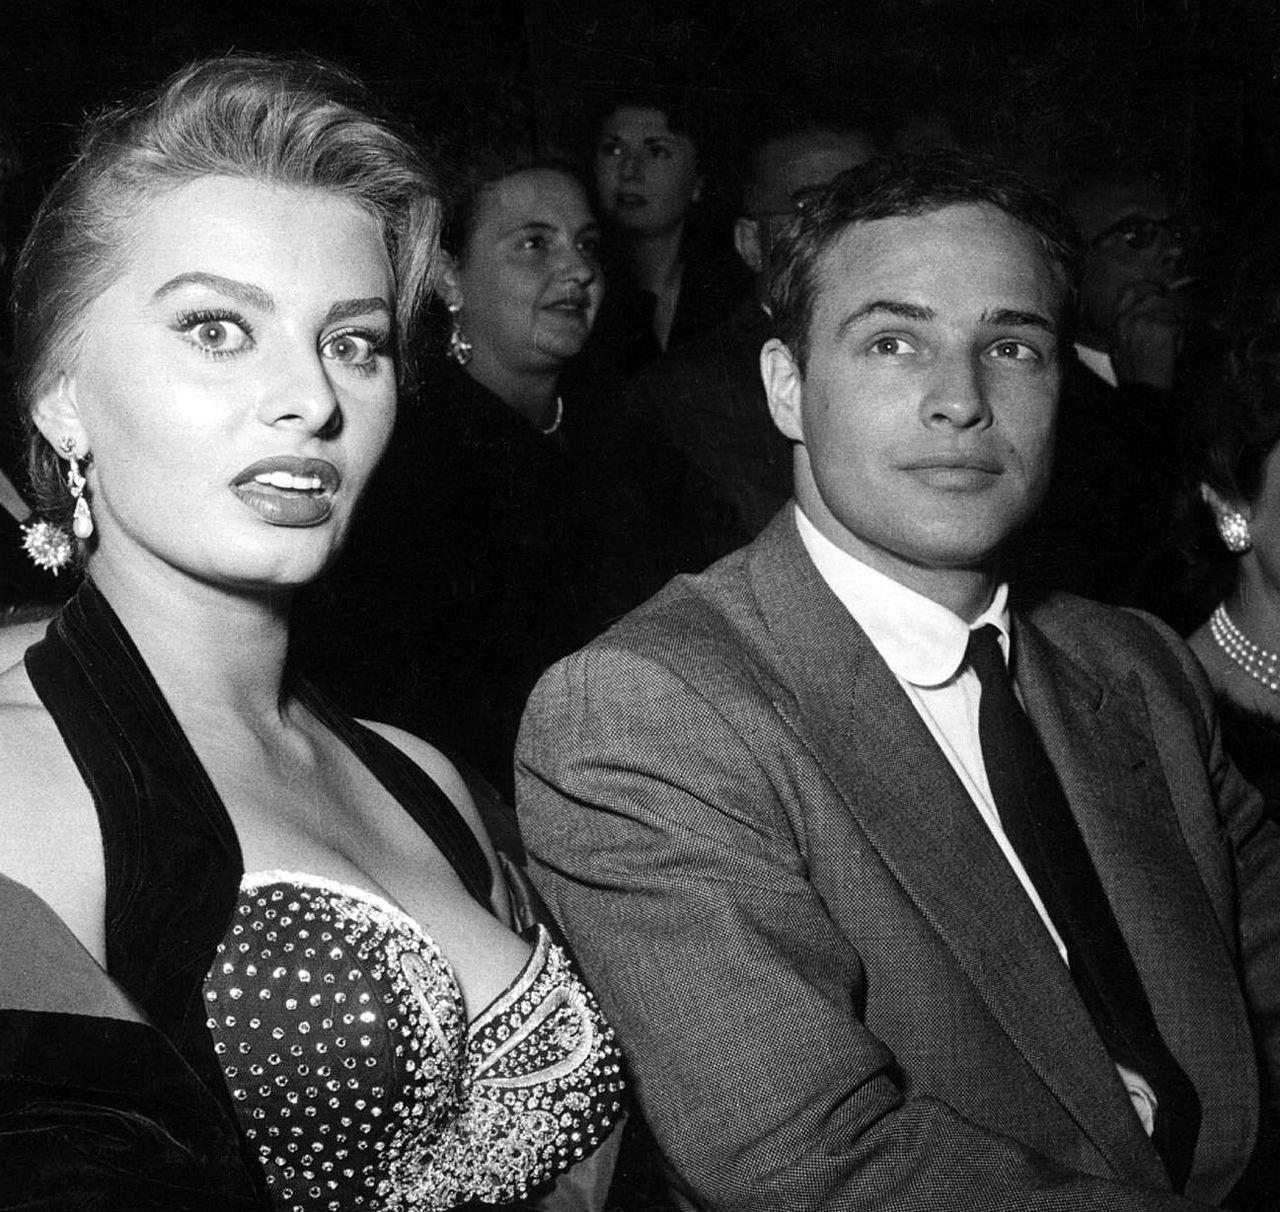 The Club Collar And The Birds Eye Suit. Marlon Brando, with Sophia Loren, 1954. #Brando #SophiaLoren